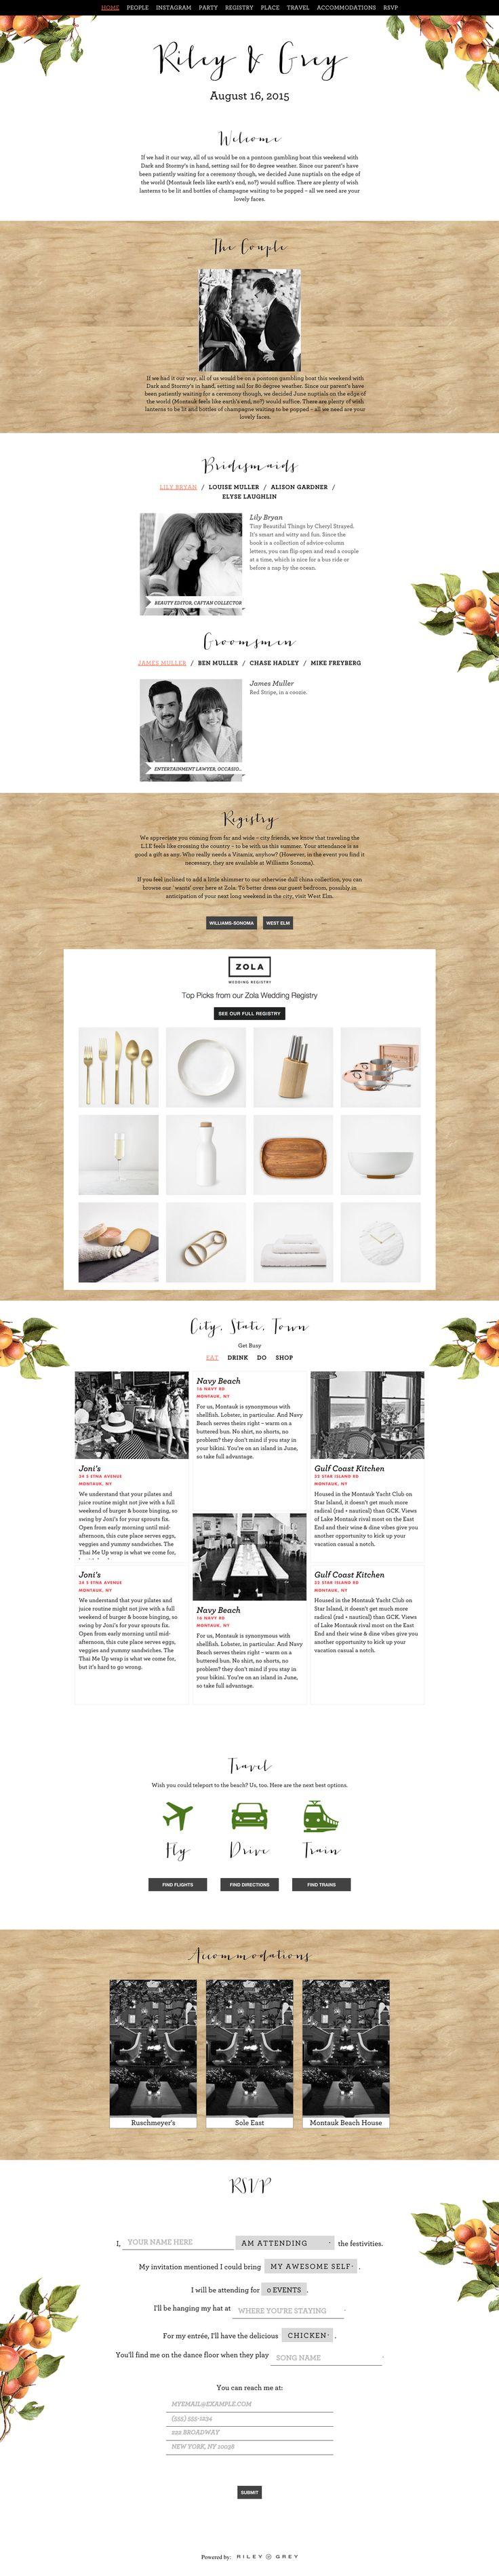 """Grove"" wedding website design by Riley & Grey (graphic design, wedding planning, wedding website example)"